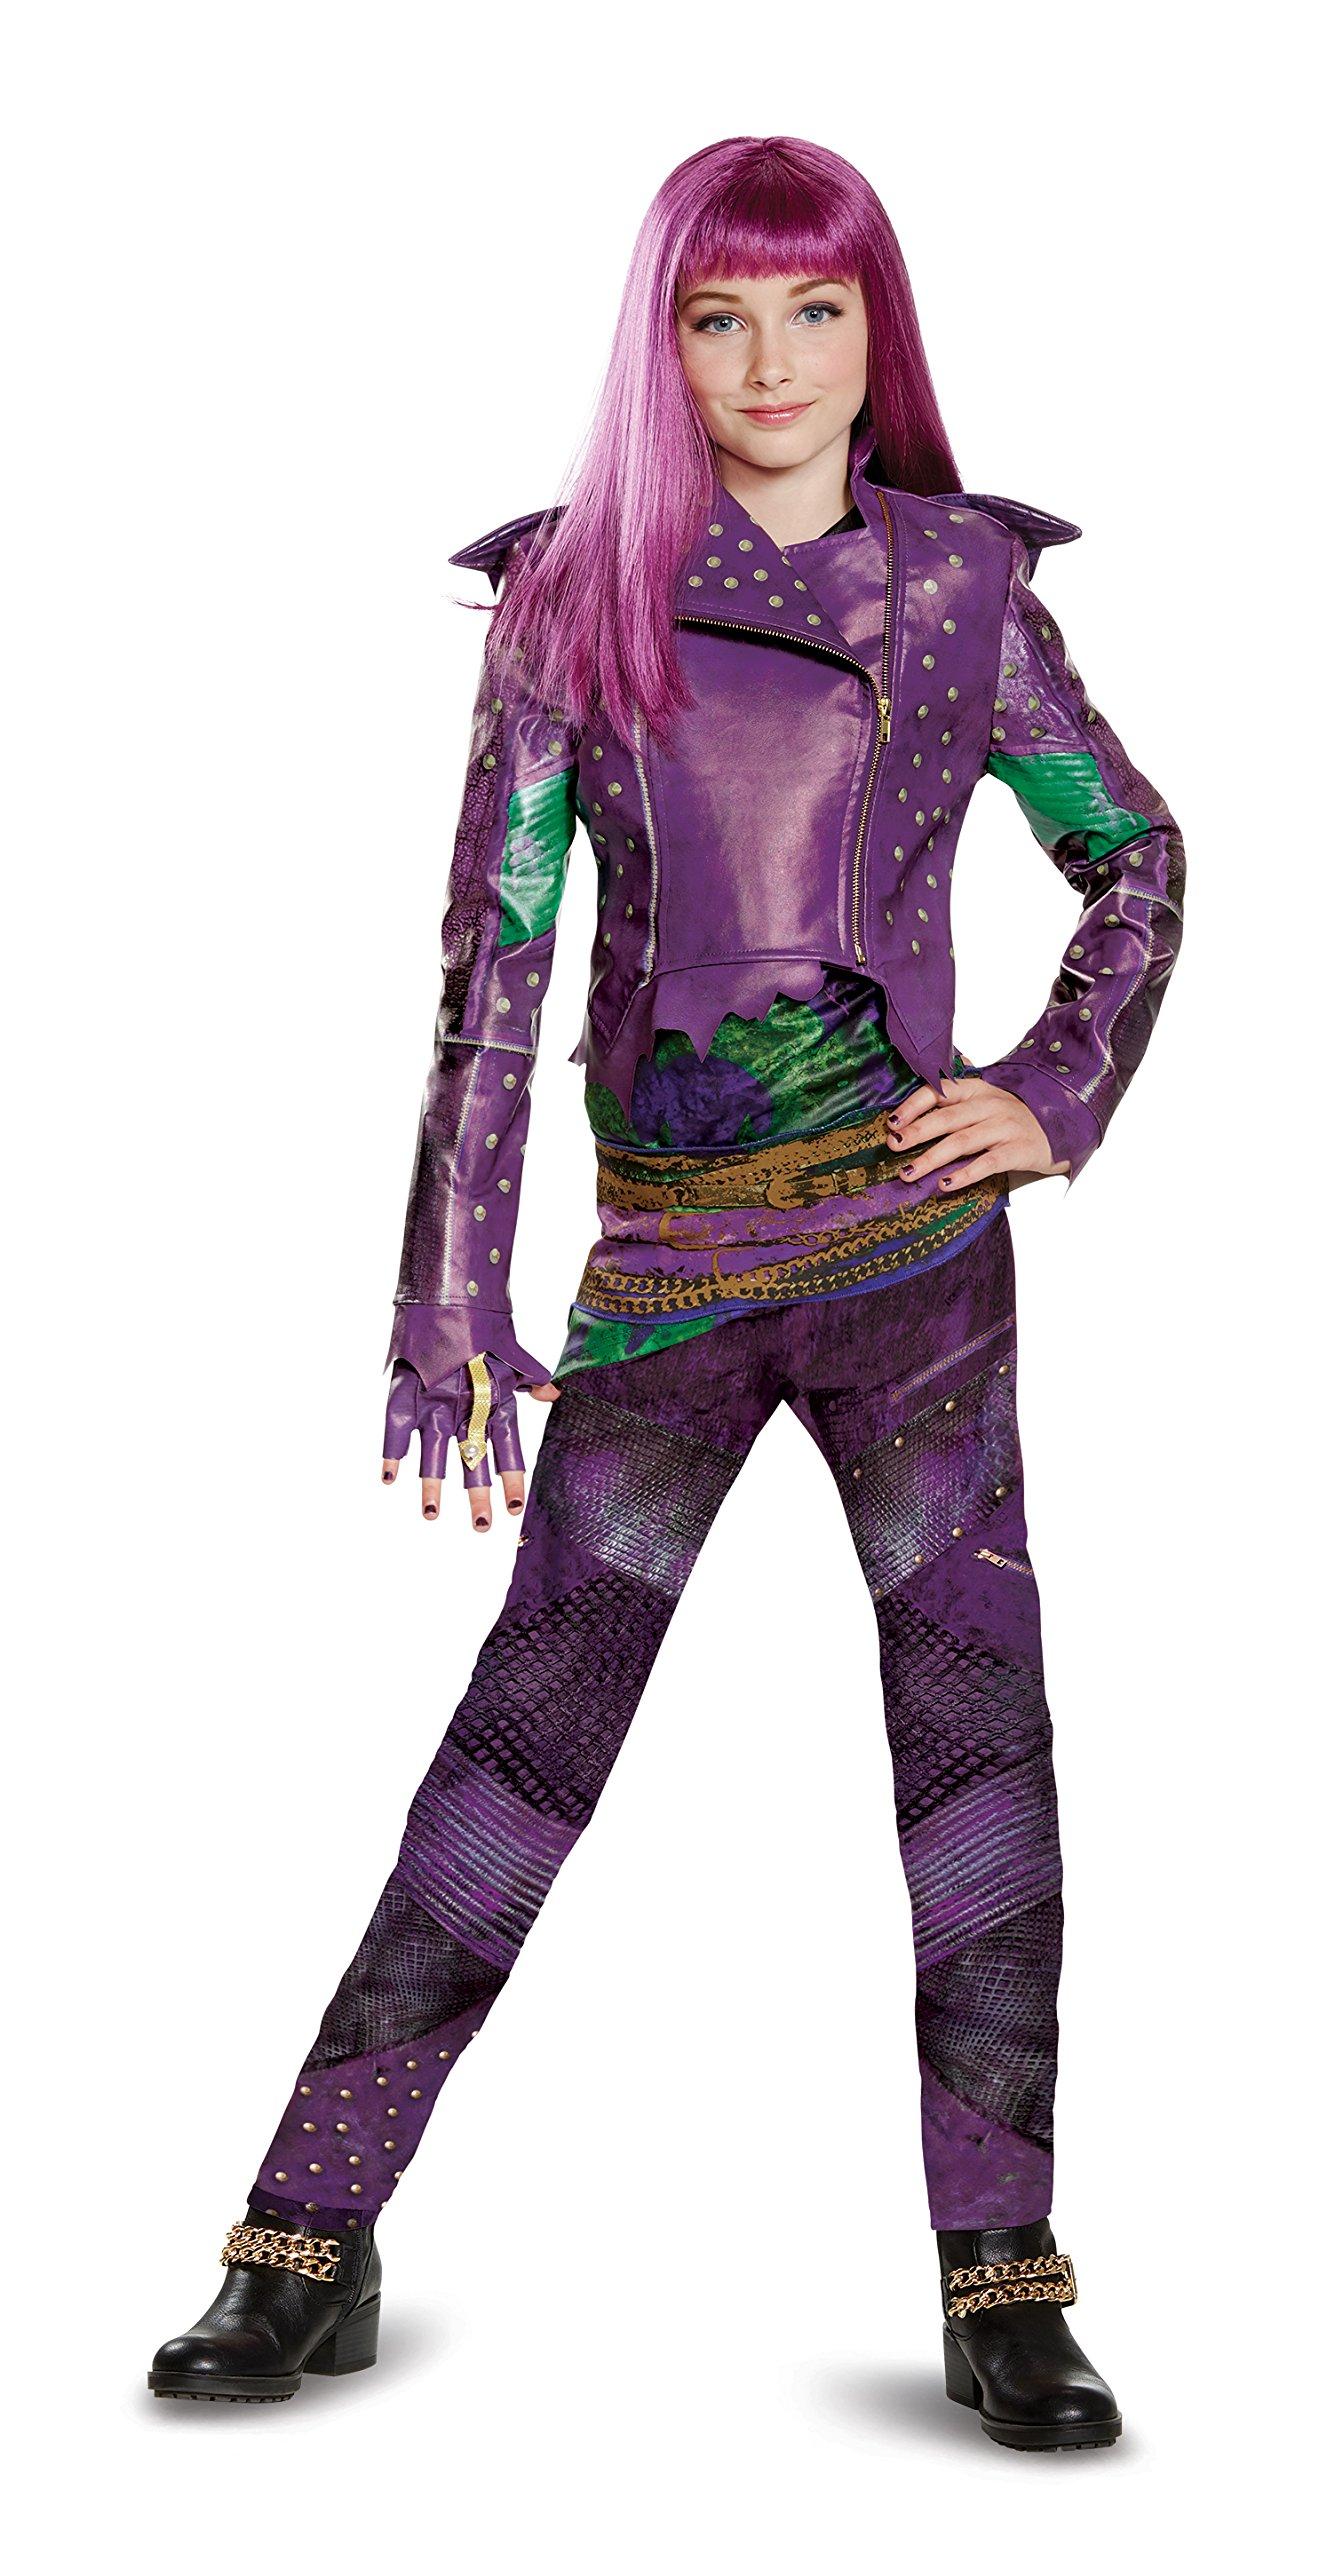 Disguise Mal Prestige Descendants 2 Costume, Purple, Medium (7-8)